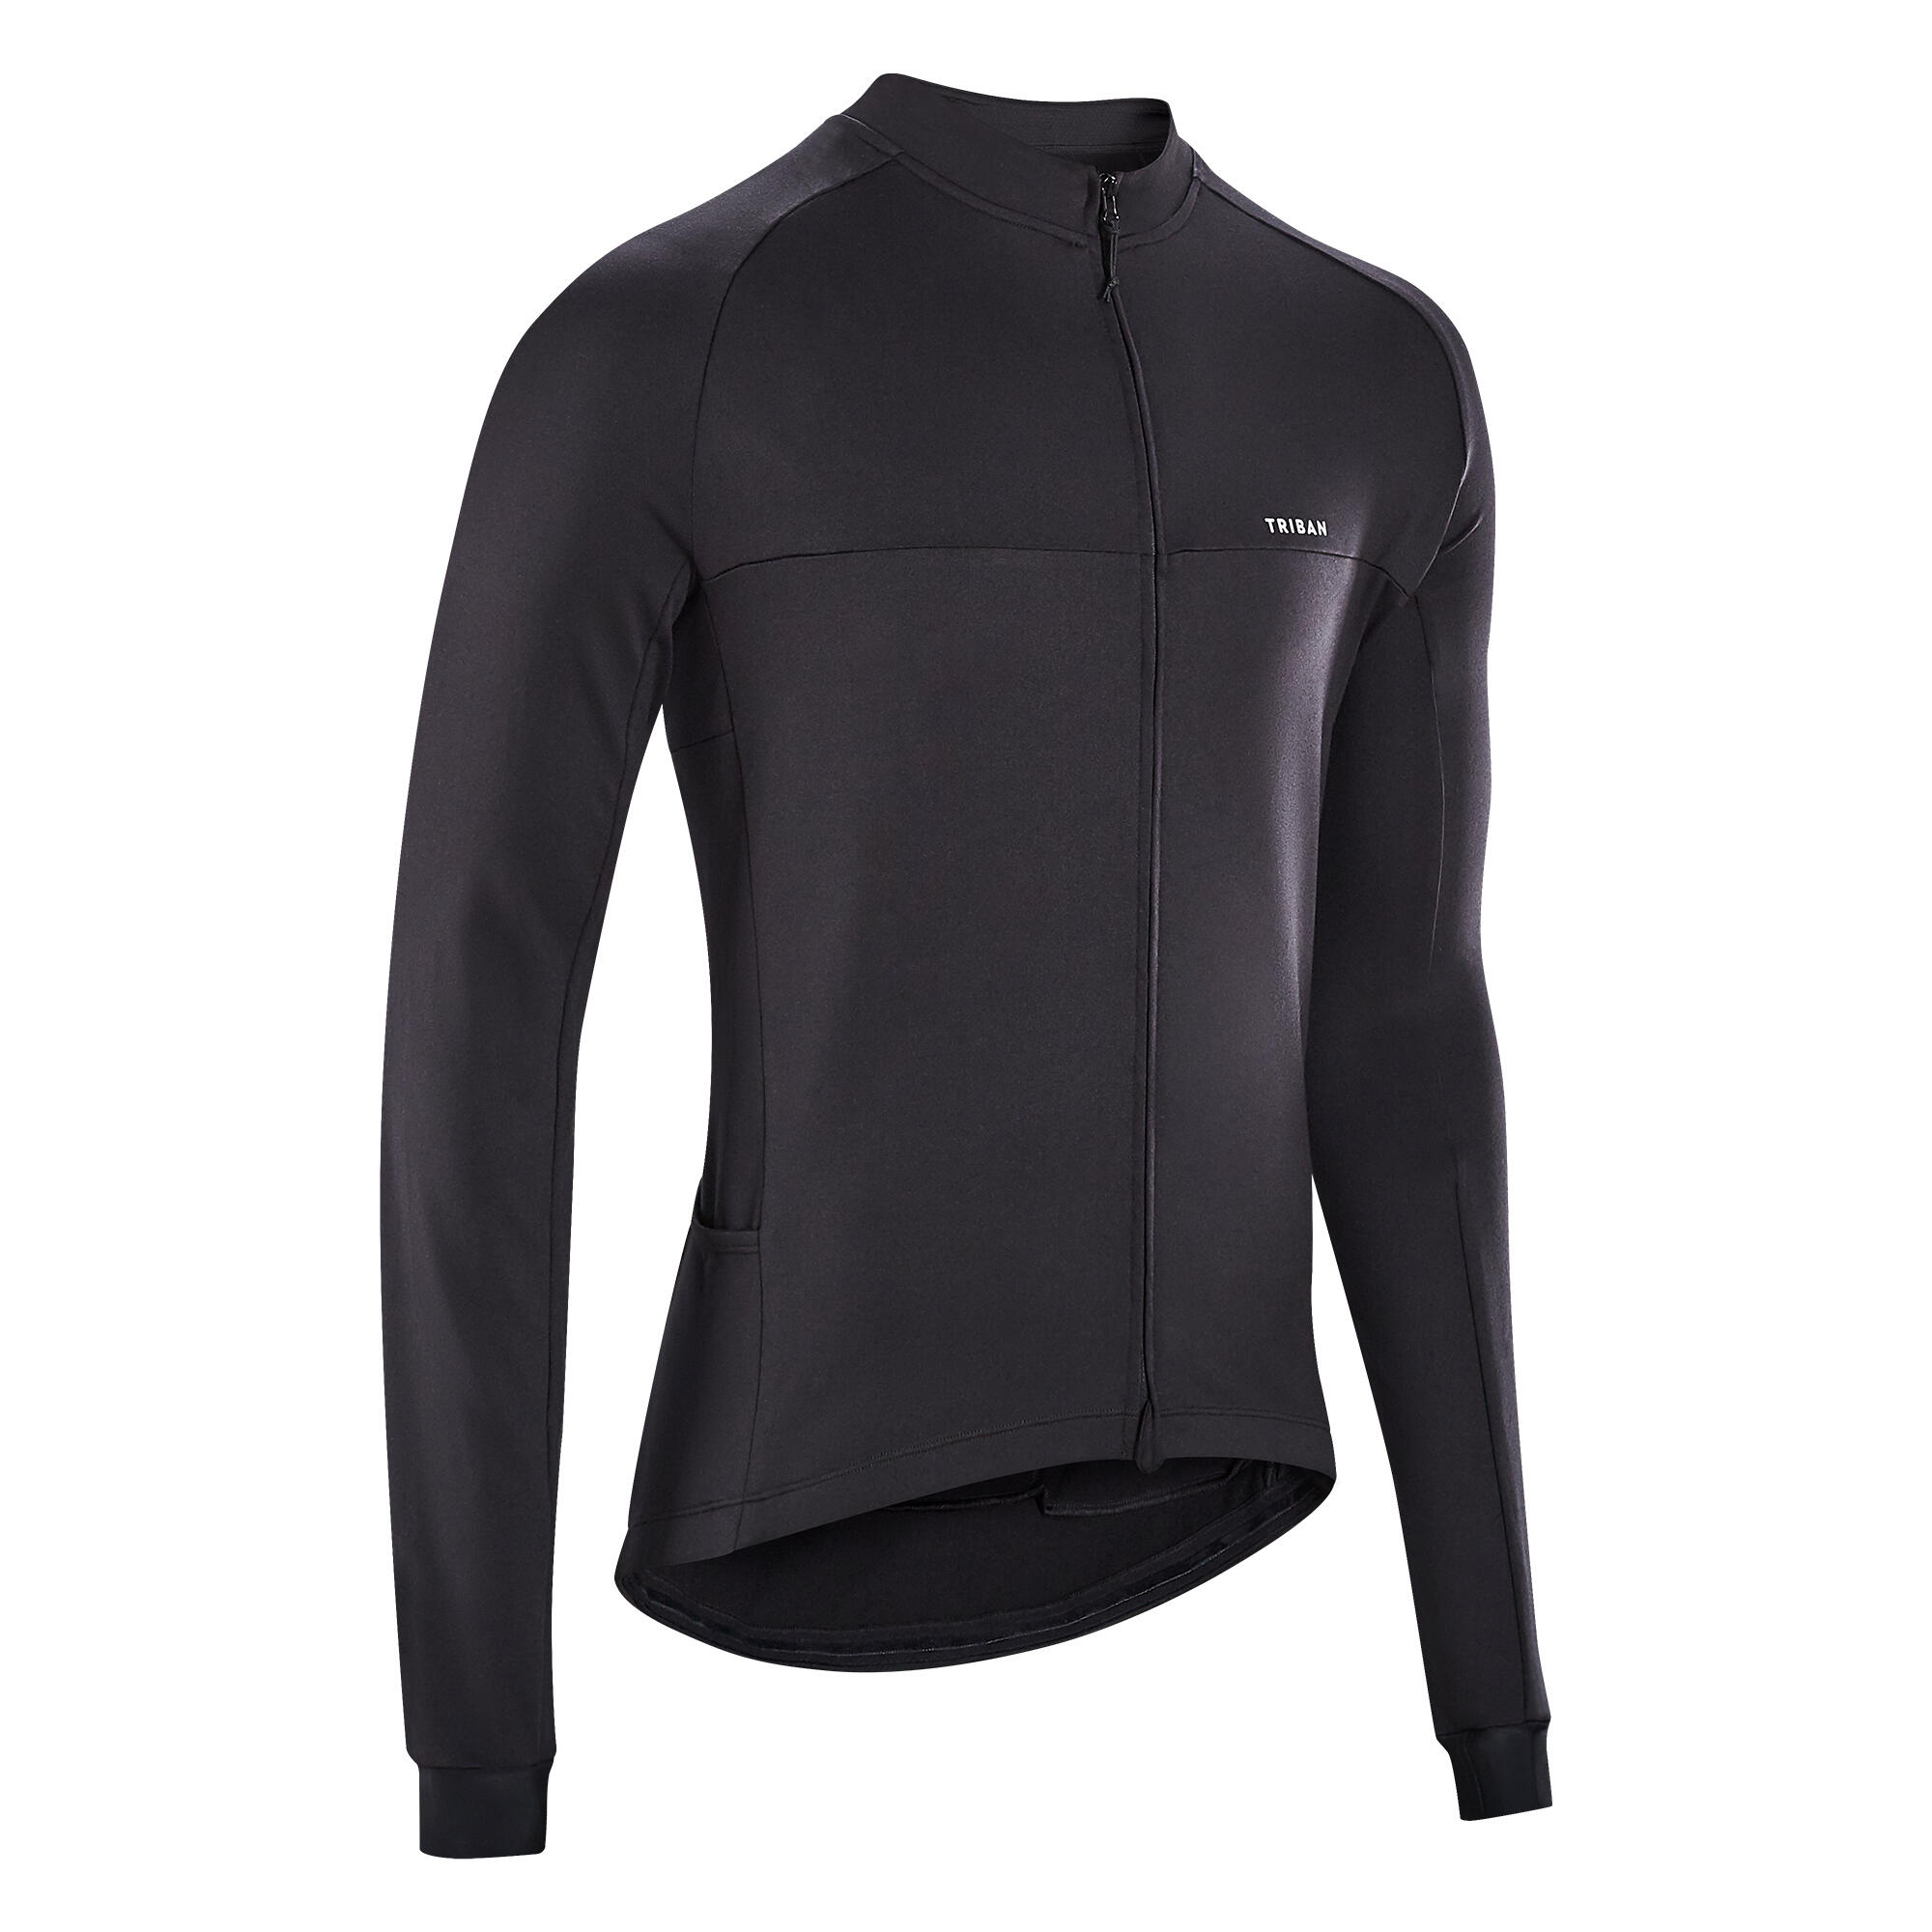 Bluză ciclism RC 100 Bărbați imagine produs